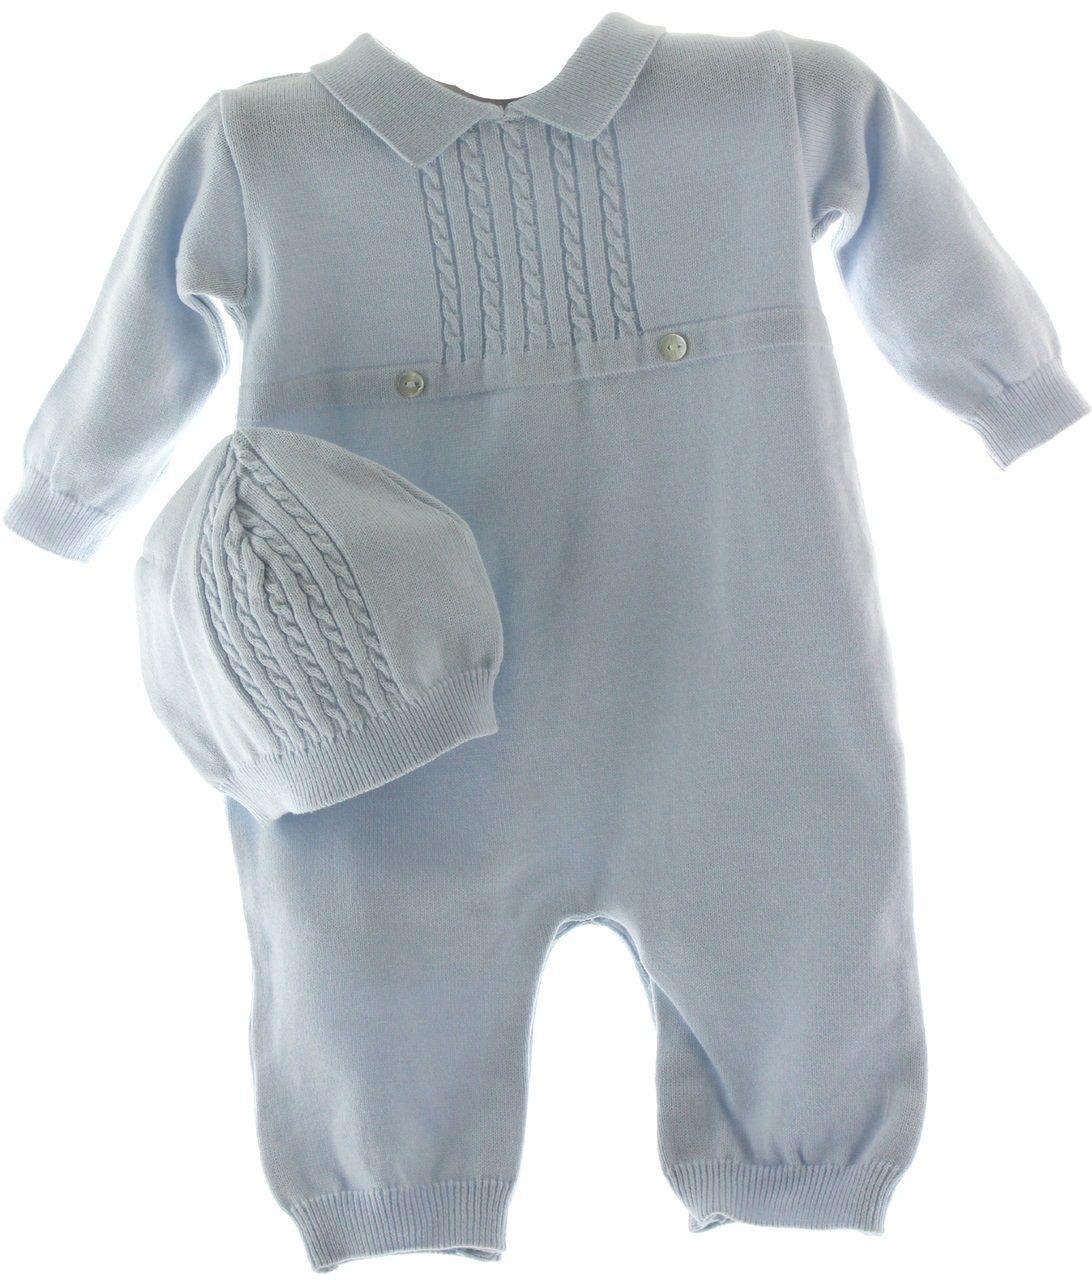 3fc9e8215 Baby Boys Blue Knit Long Sleeve Romper   Hat Set